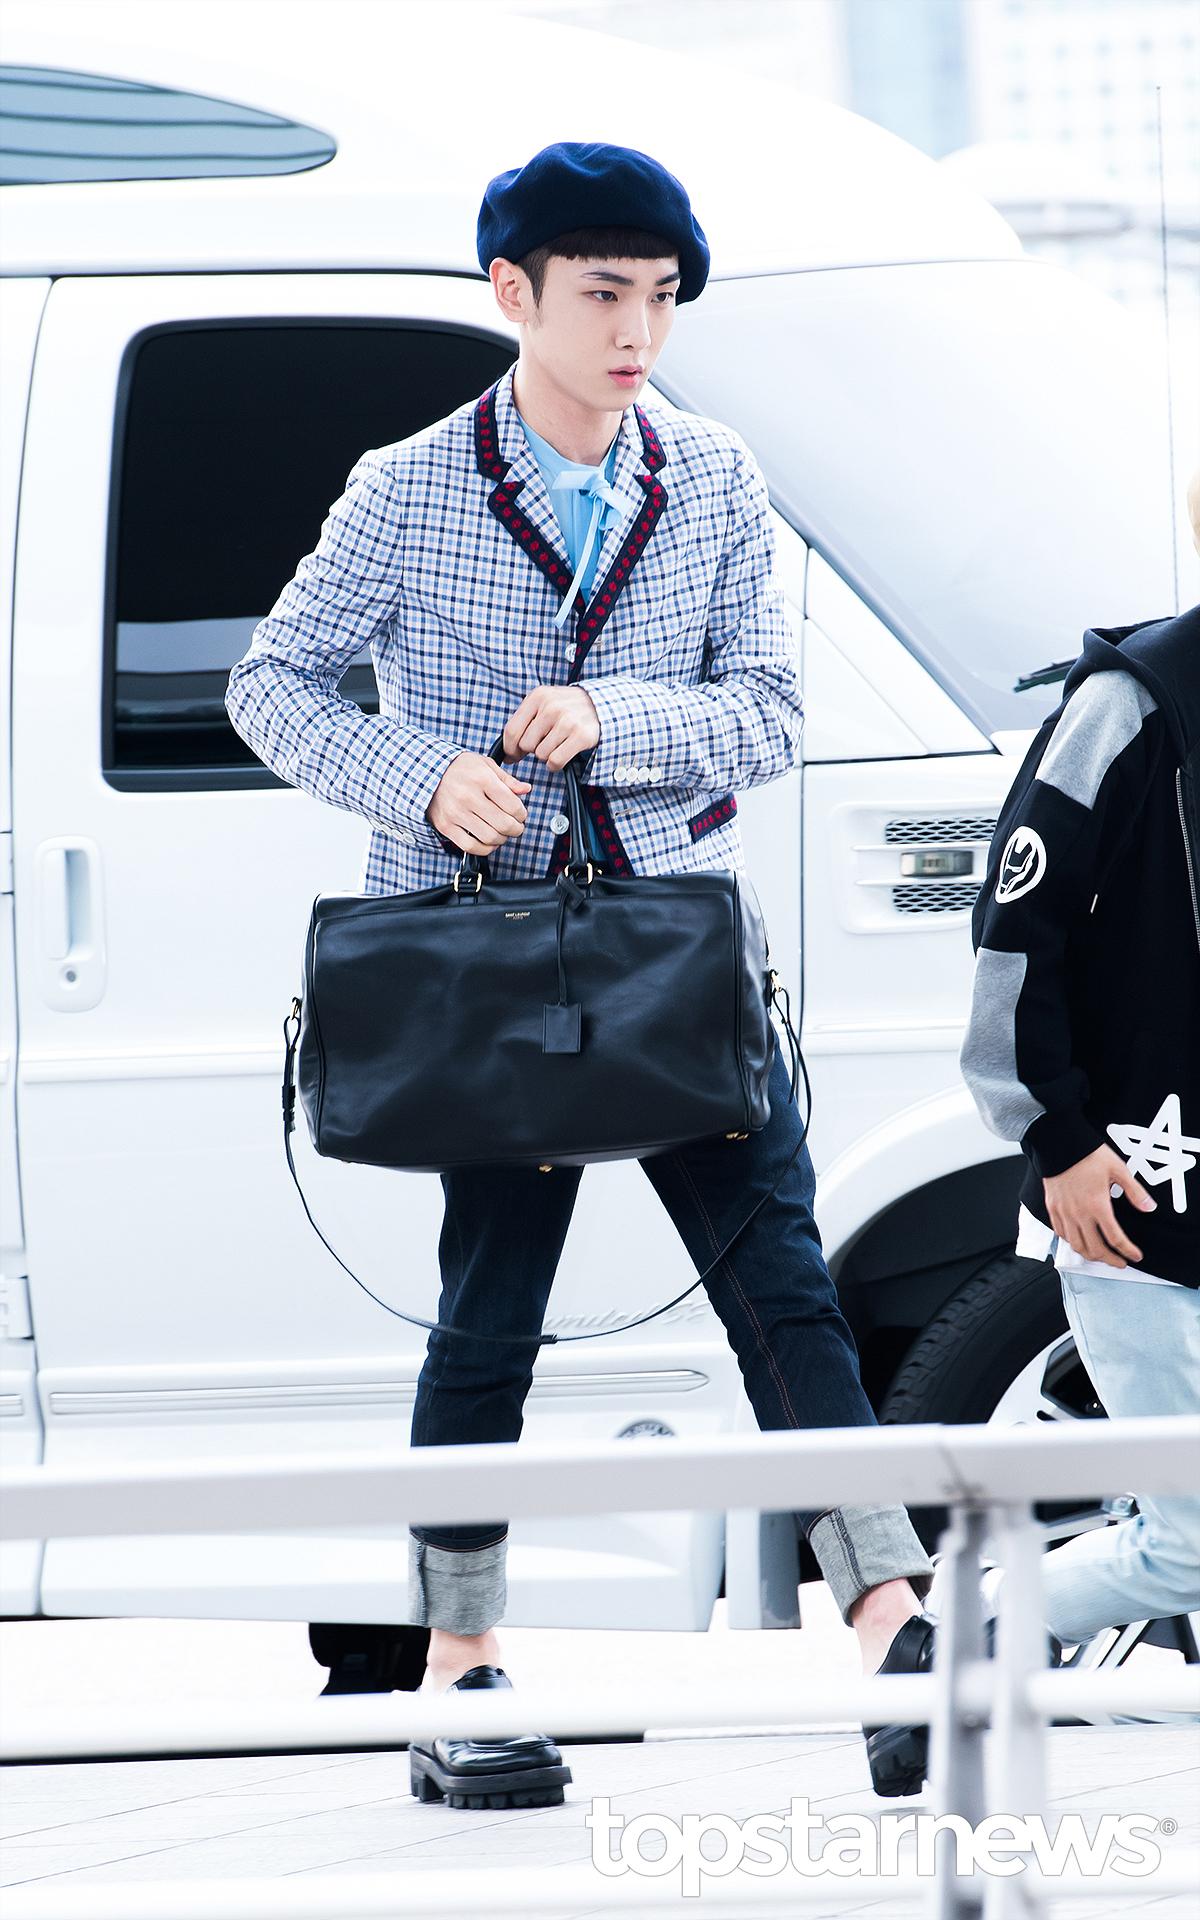 [IMG/160715] Jonghyun, Key @ Aeropuerto Incheon hacia Japón. UvFl2QkS